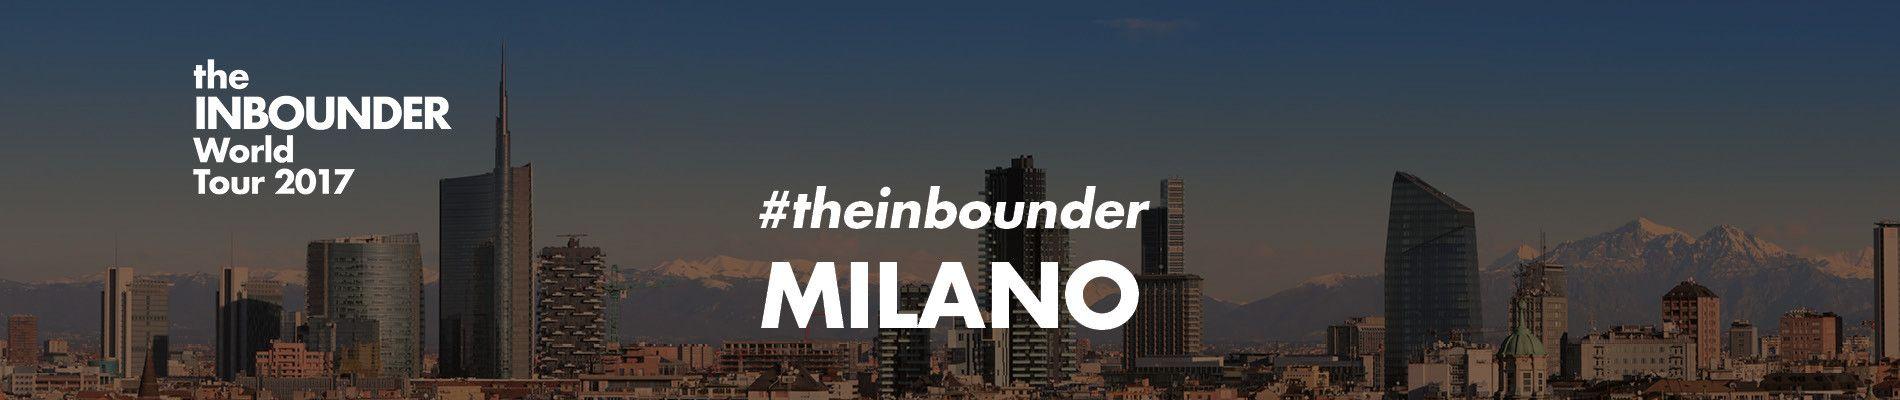 inbounder world tour milano